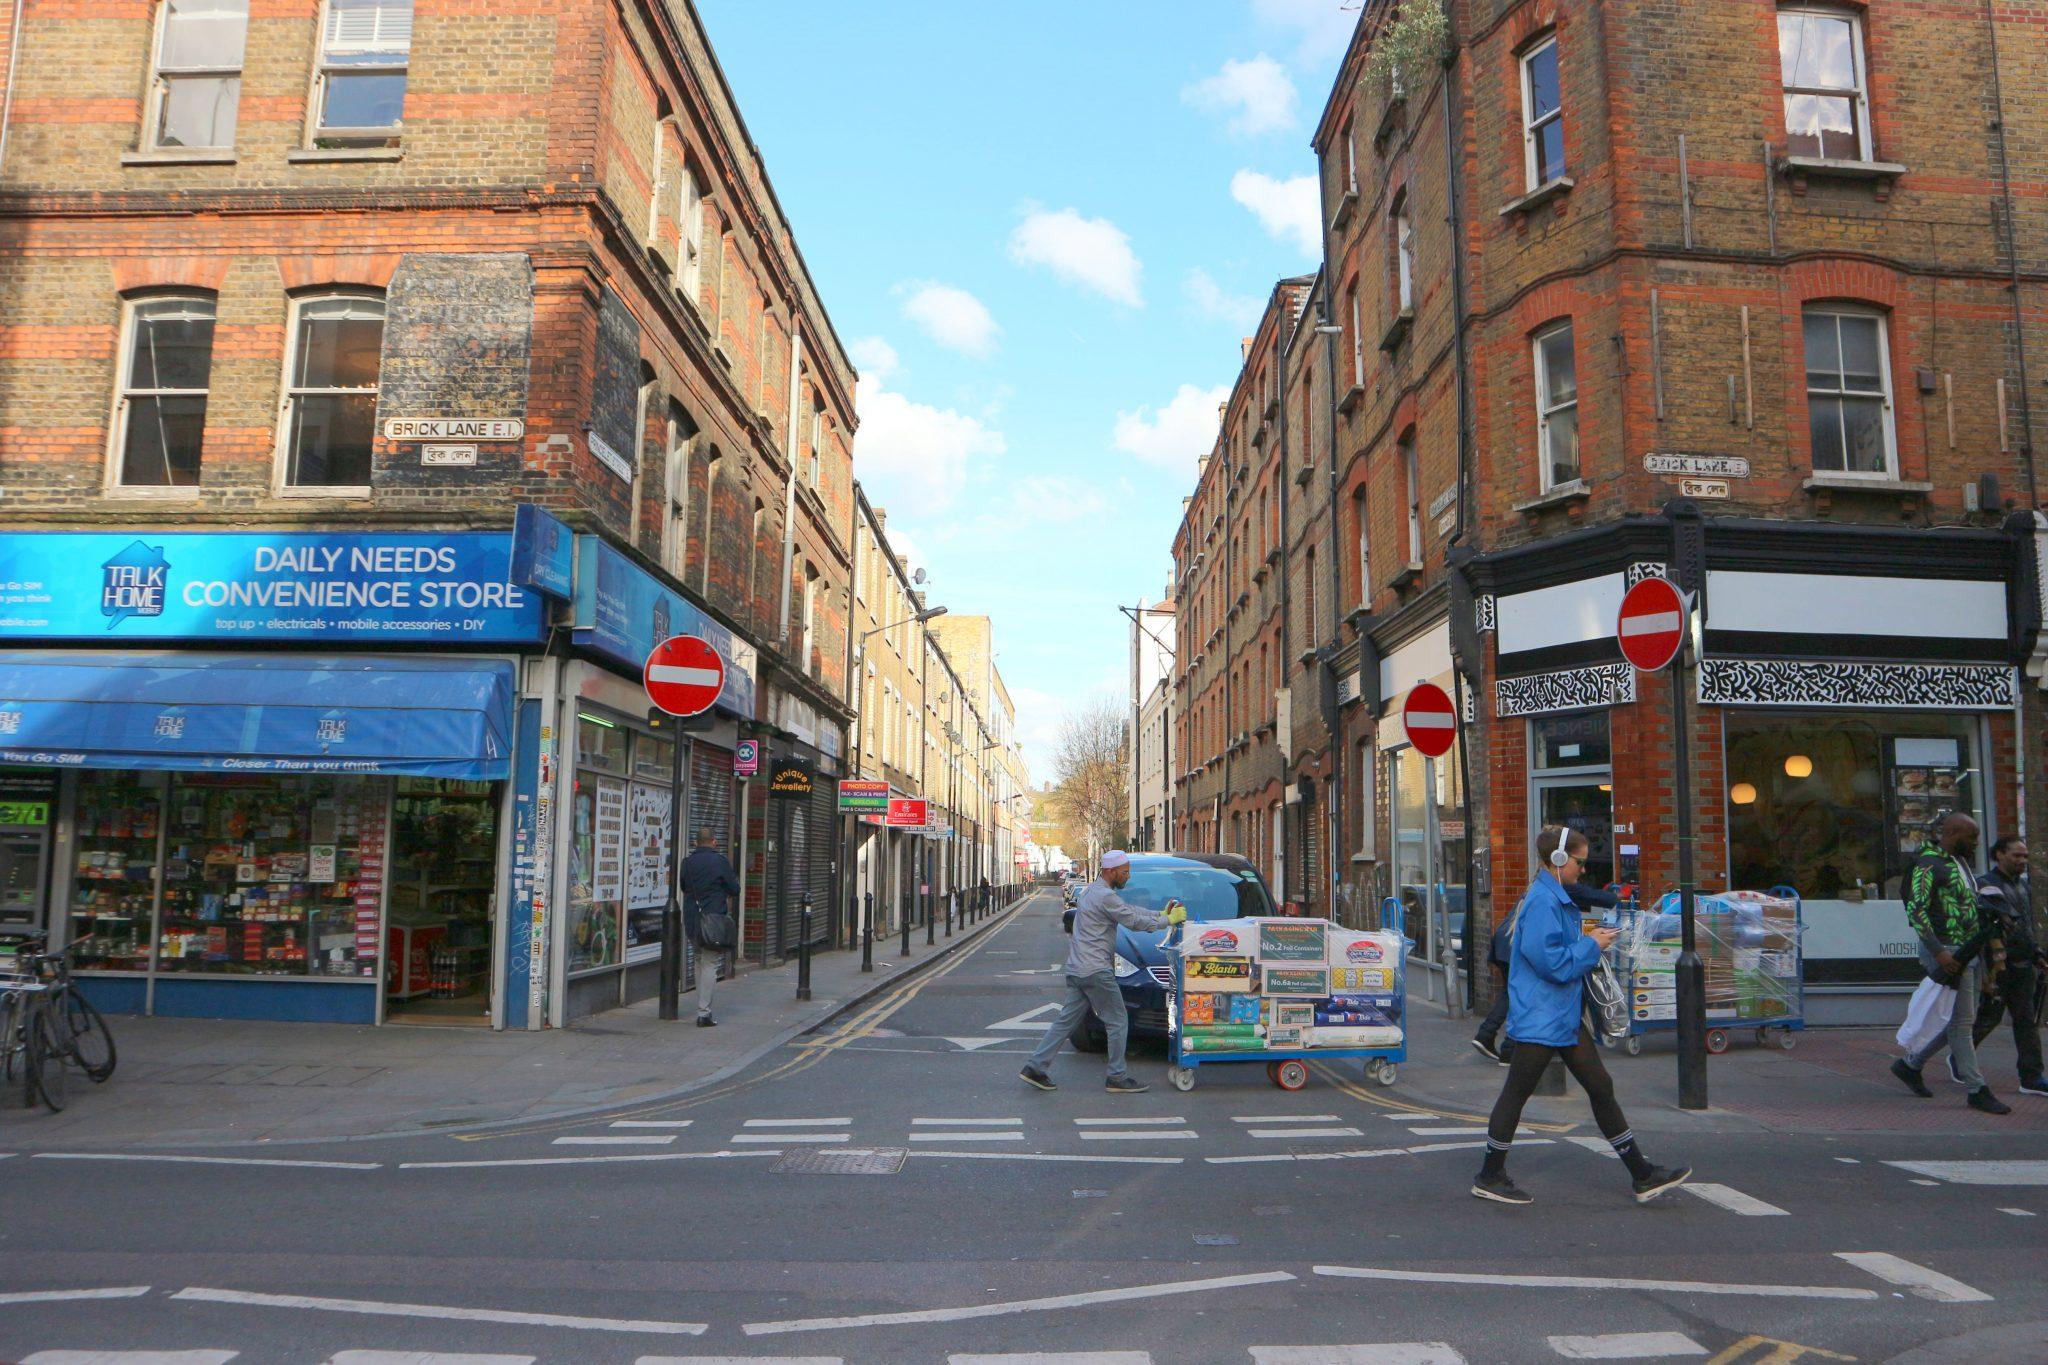 Brick Lane Lontoo nähtävyydet